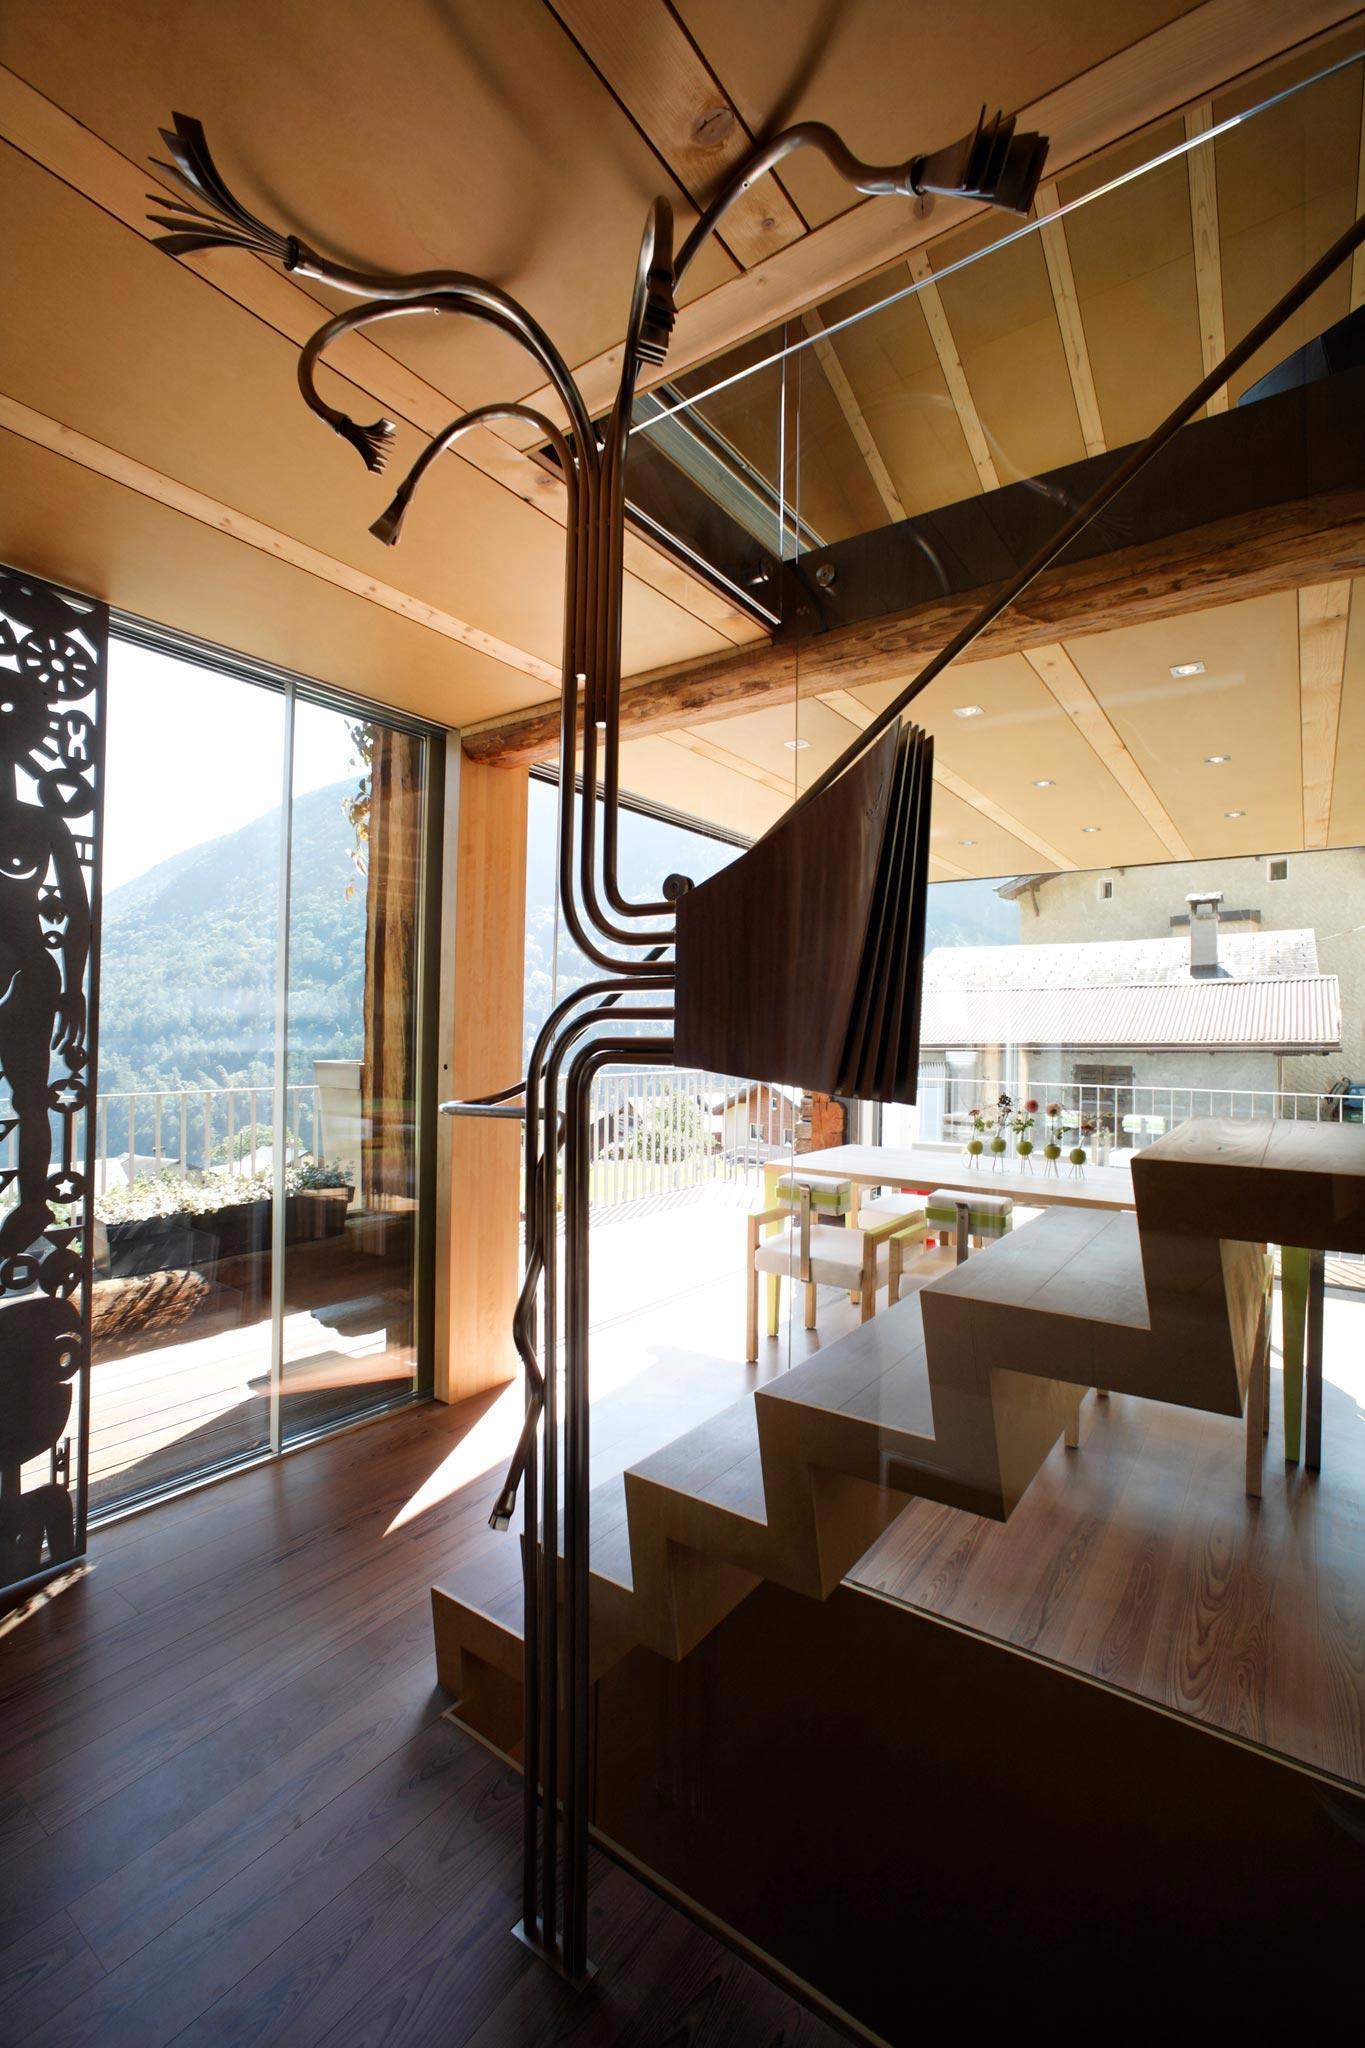 Es Gd Raccard 678 escalierRez vtc 20 05 008 - L'escalier du Grand Raccard